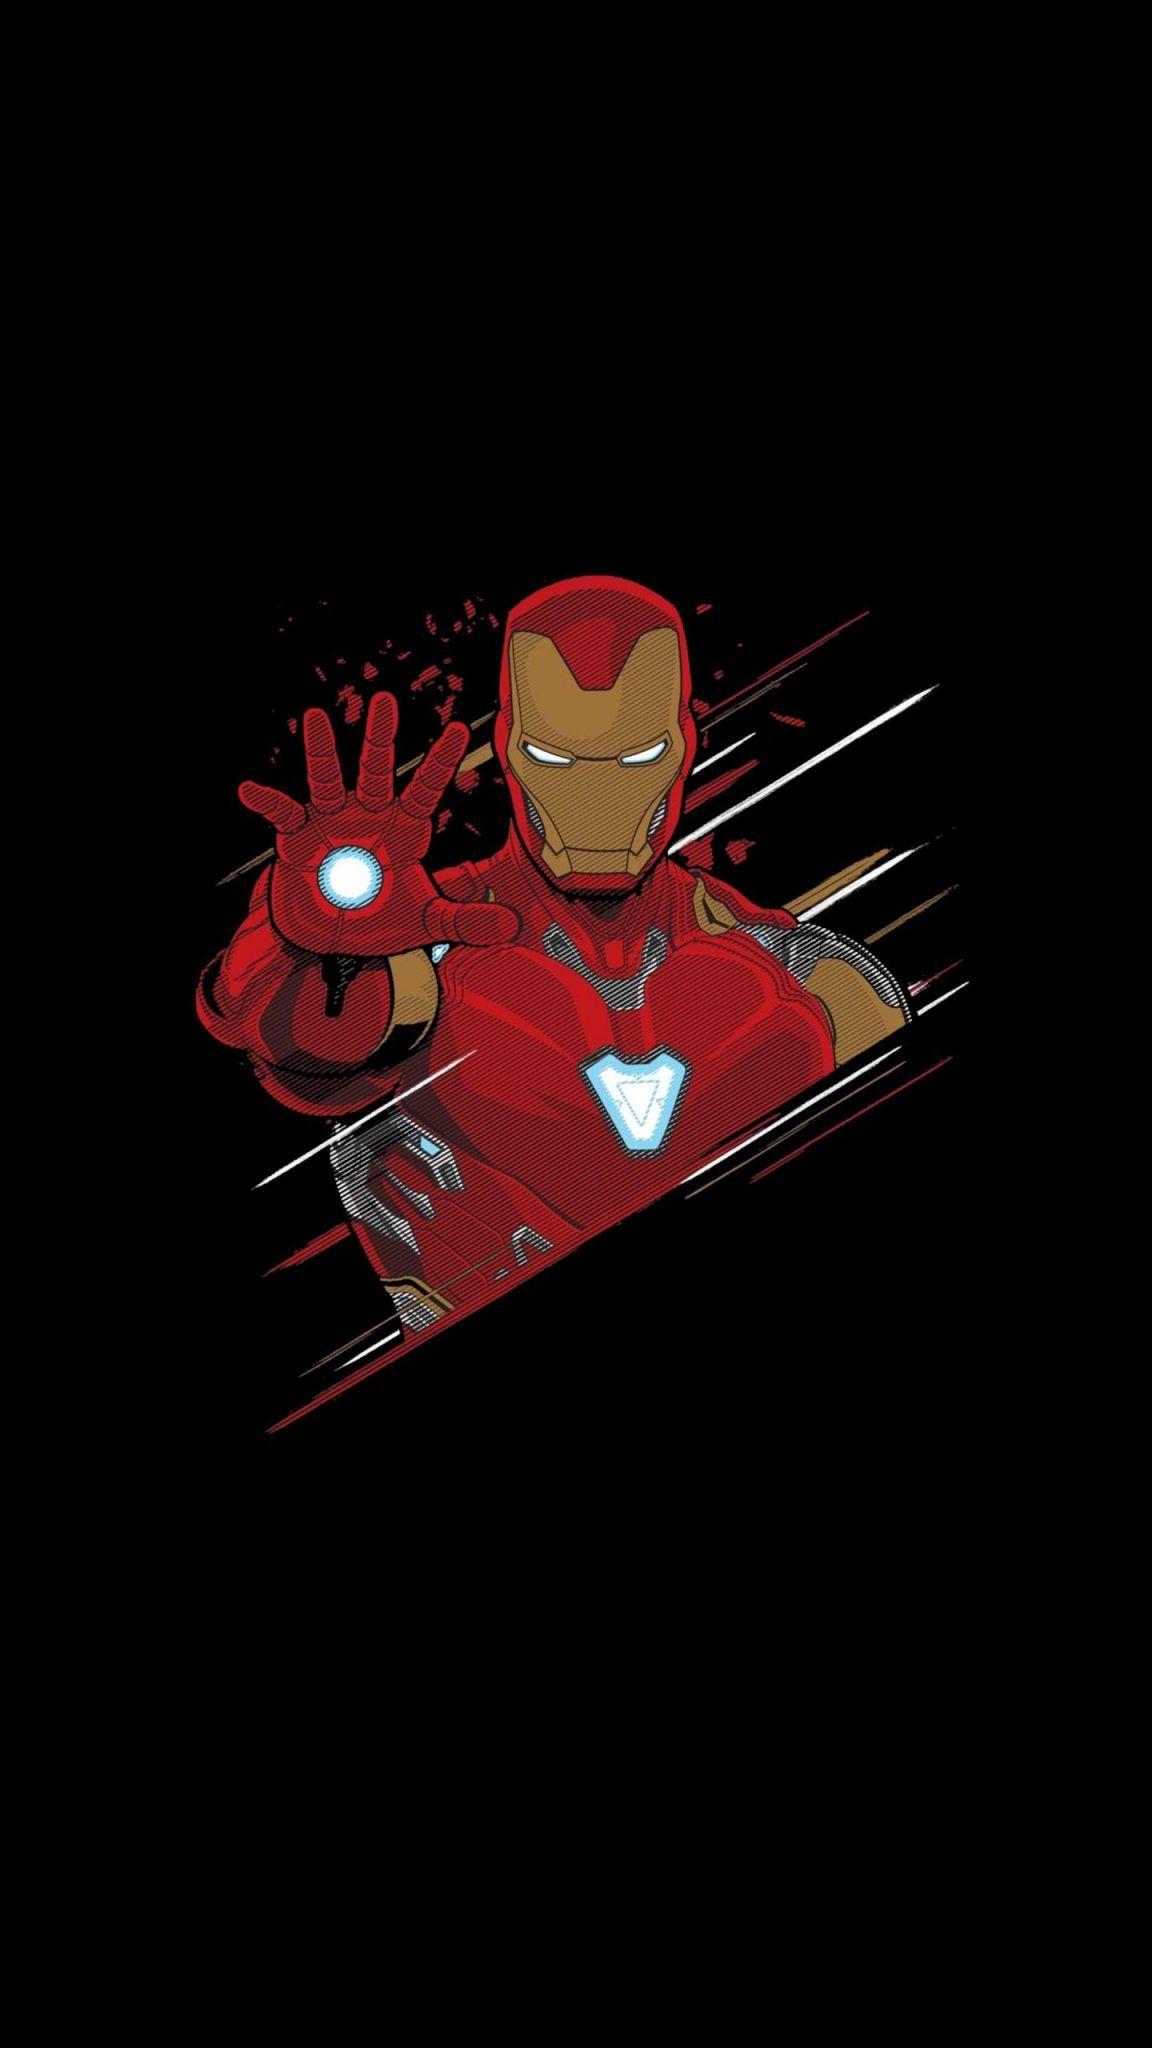 Amoled Archives Traxzee Iron Man Wallpaper Iron Man Hd Wallpaper Iron Man Art